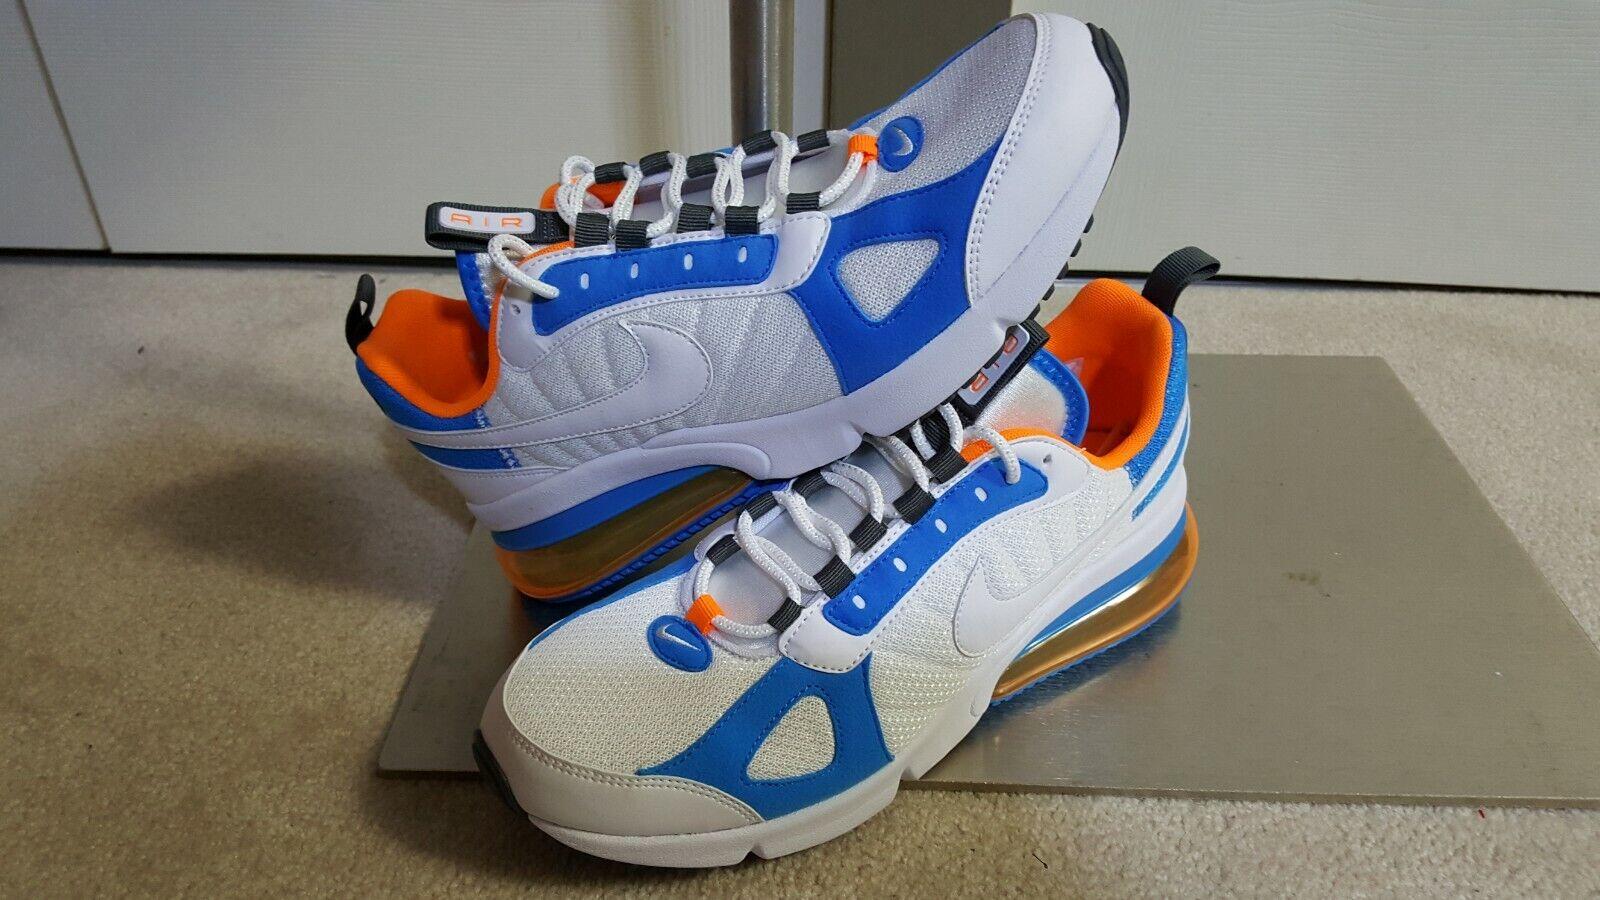 2b884d1c1172 New Men NIKE AIR MAX 270 FUTURA FUTURA FUTURA low top running sneakers Size  9.5 712ff6 ...